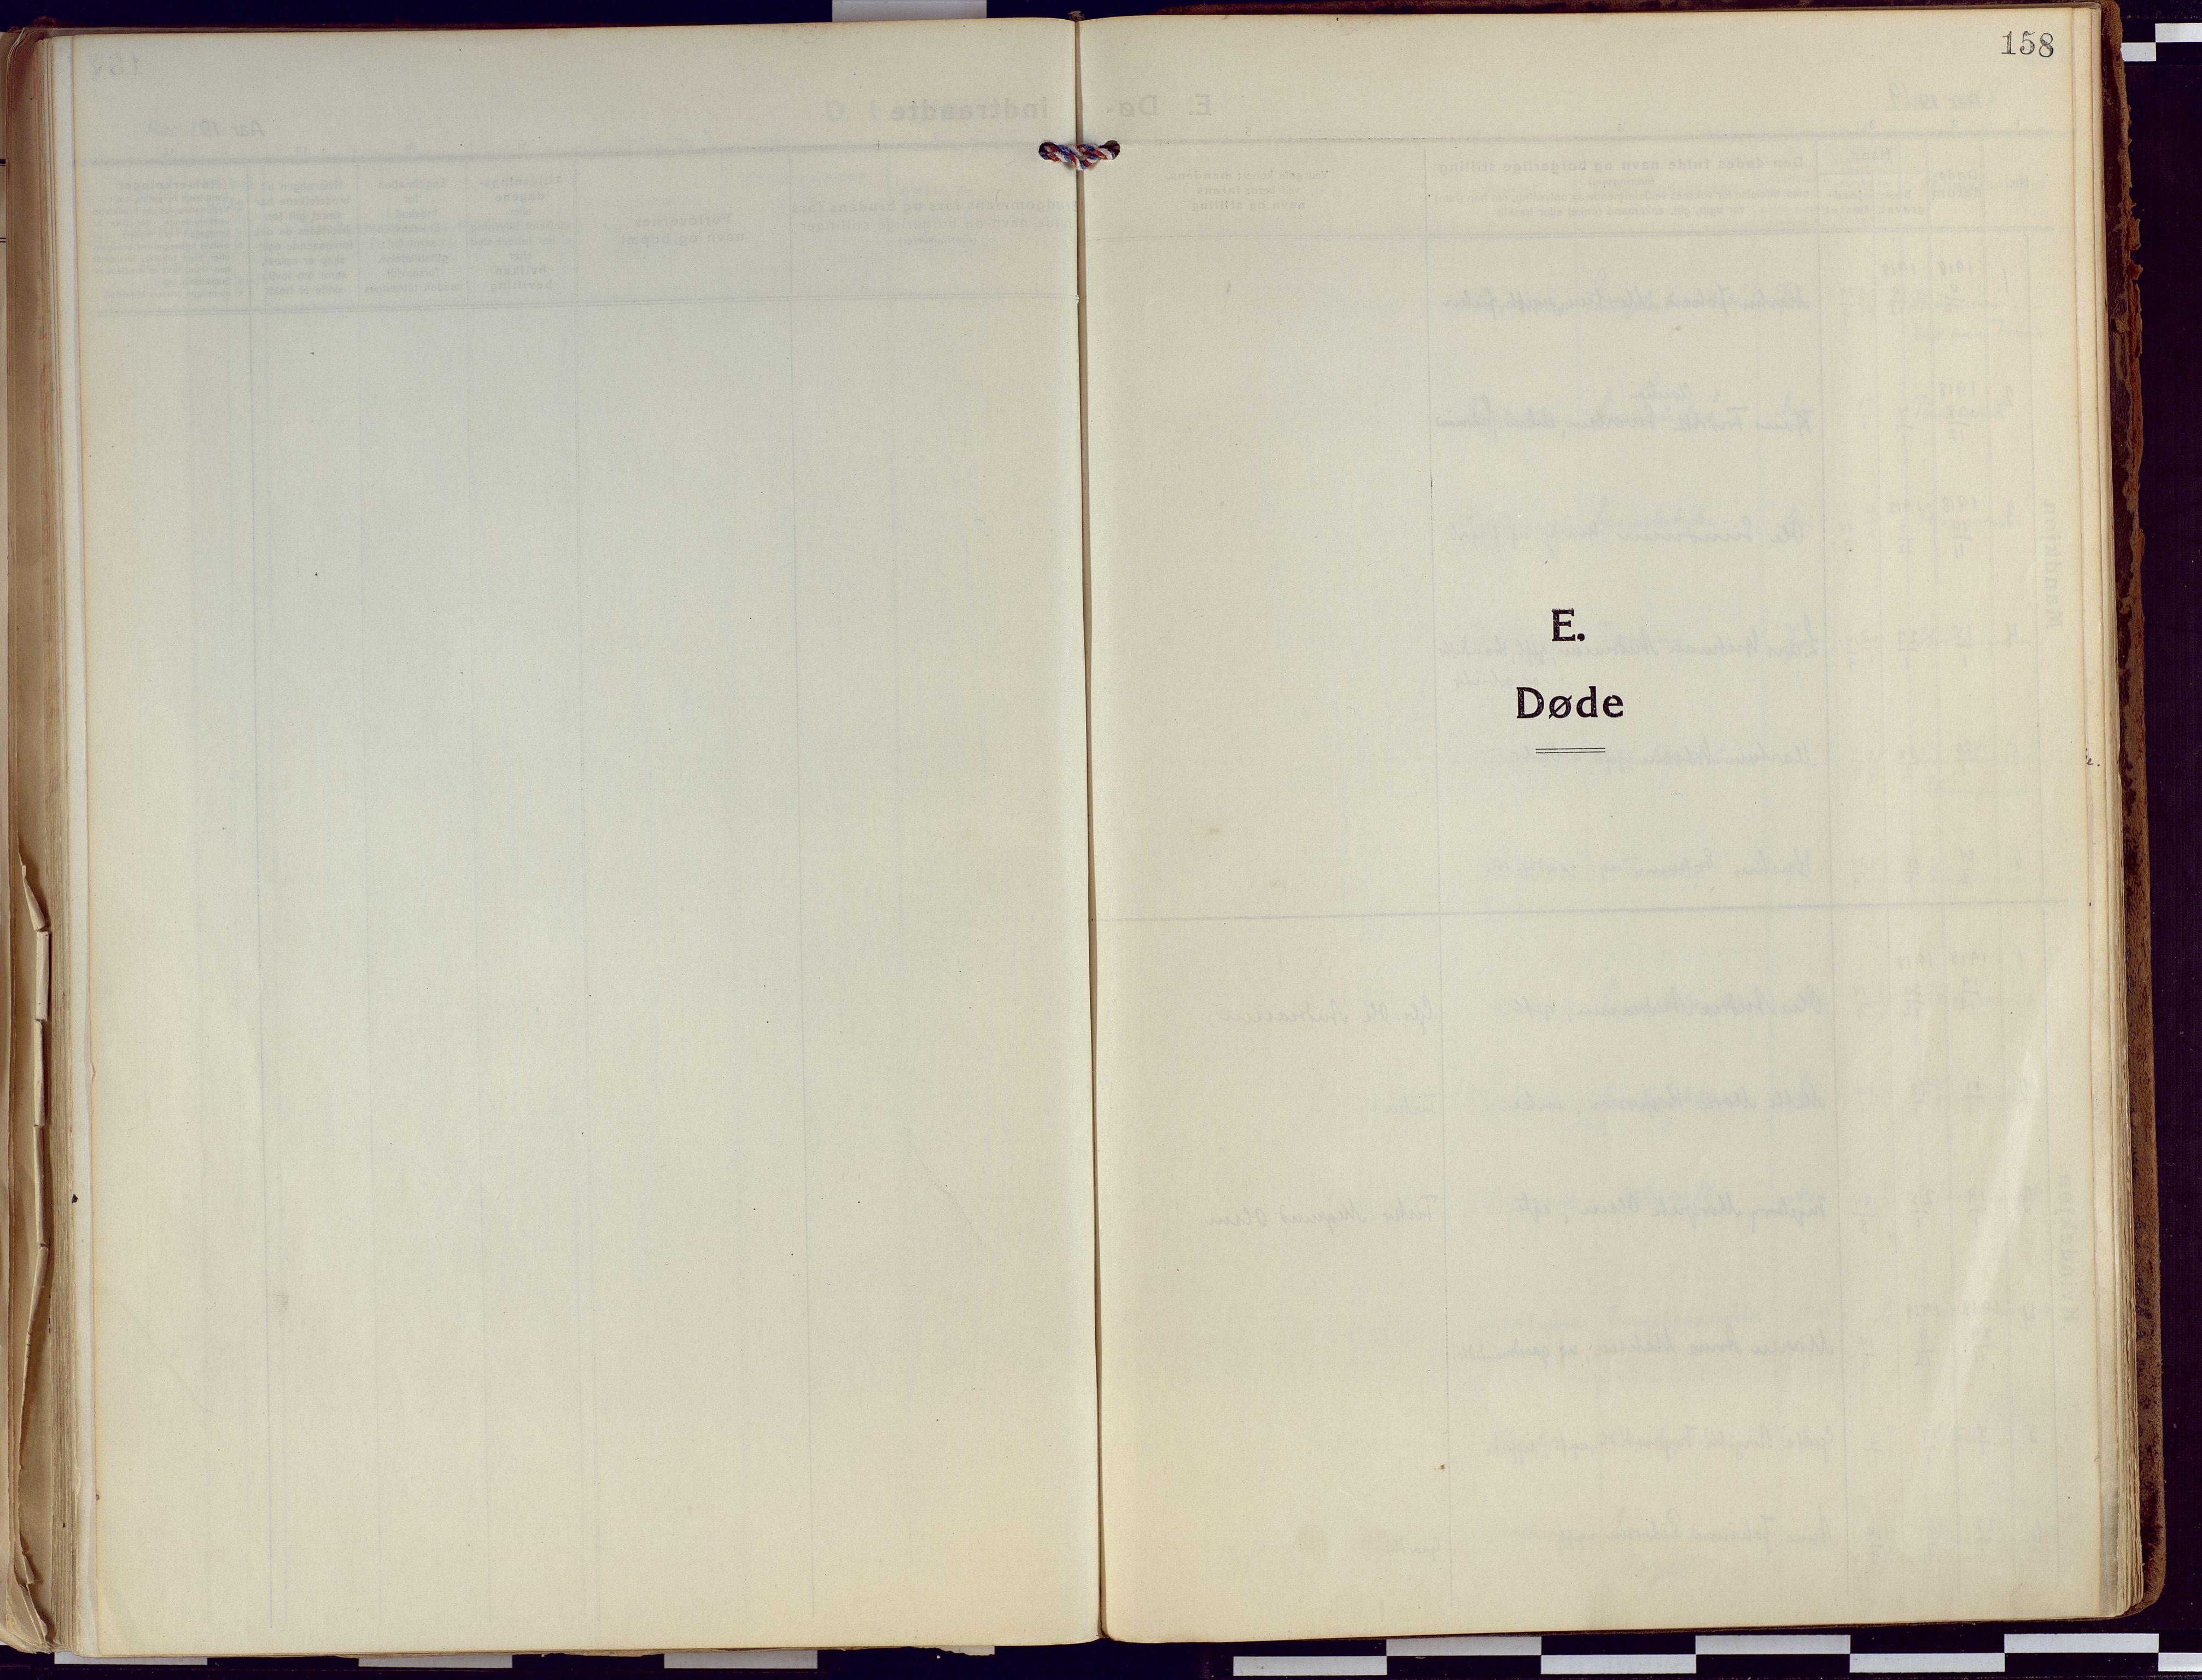 SATØ, Tranøy sokneprestkontor, I/Ia/Iaa/L0015kirke: Ministerialbok nr. 15, 1919-1928, s. 158